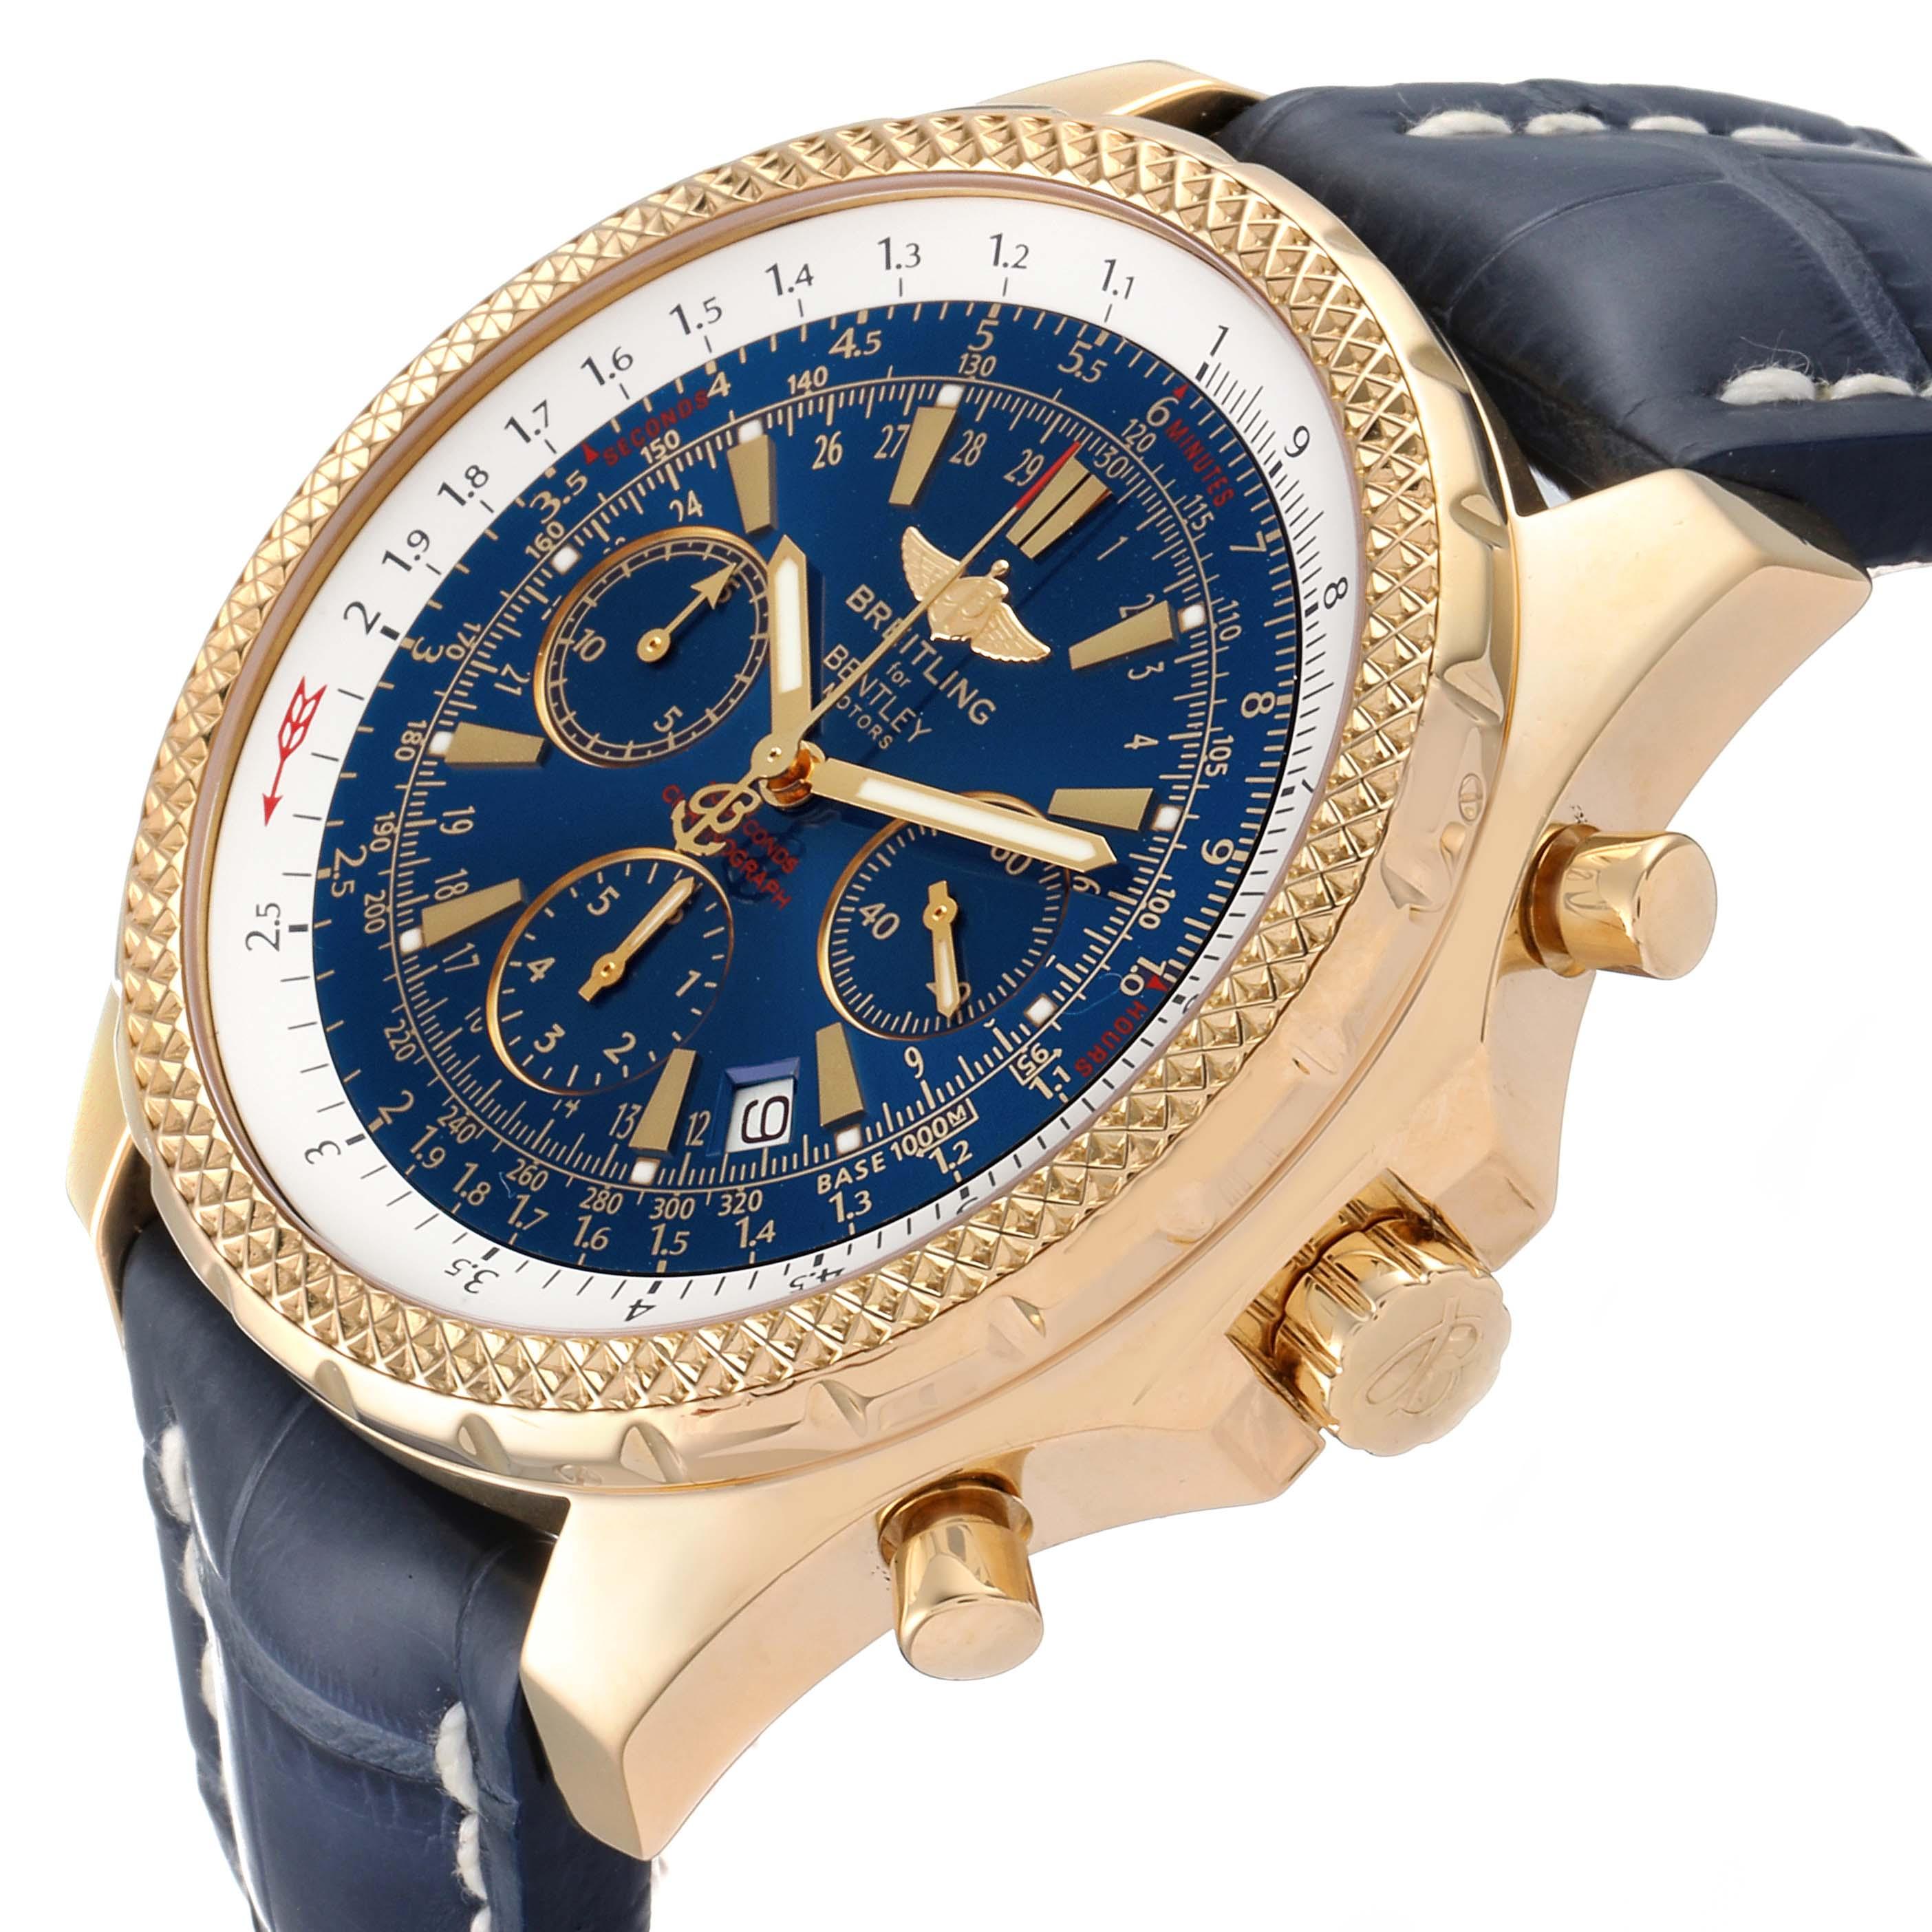 Breitling Bentley Yellow Gold Blue Dial Chronograph Watch K25362 Box SwissWatchExpo